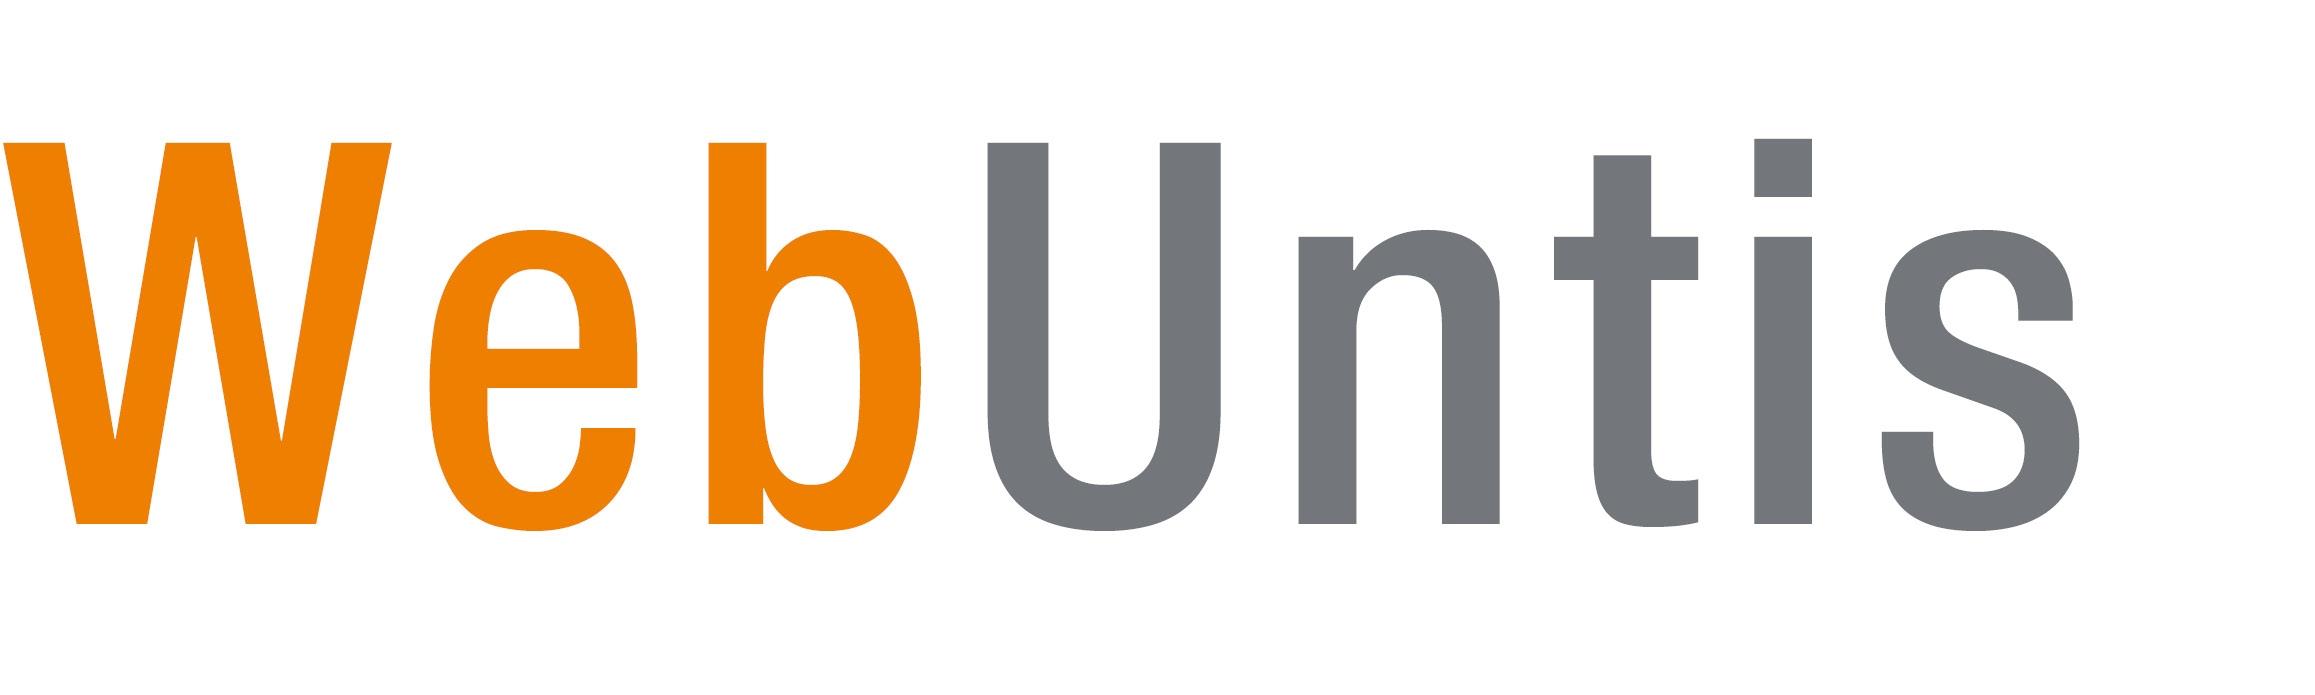 webuntis logo